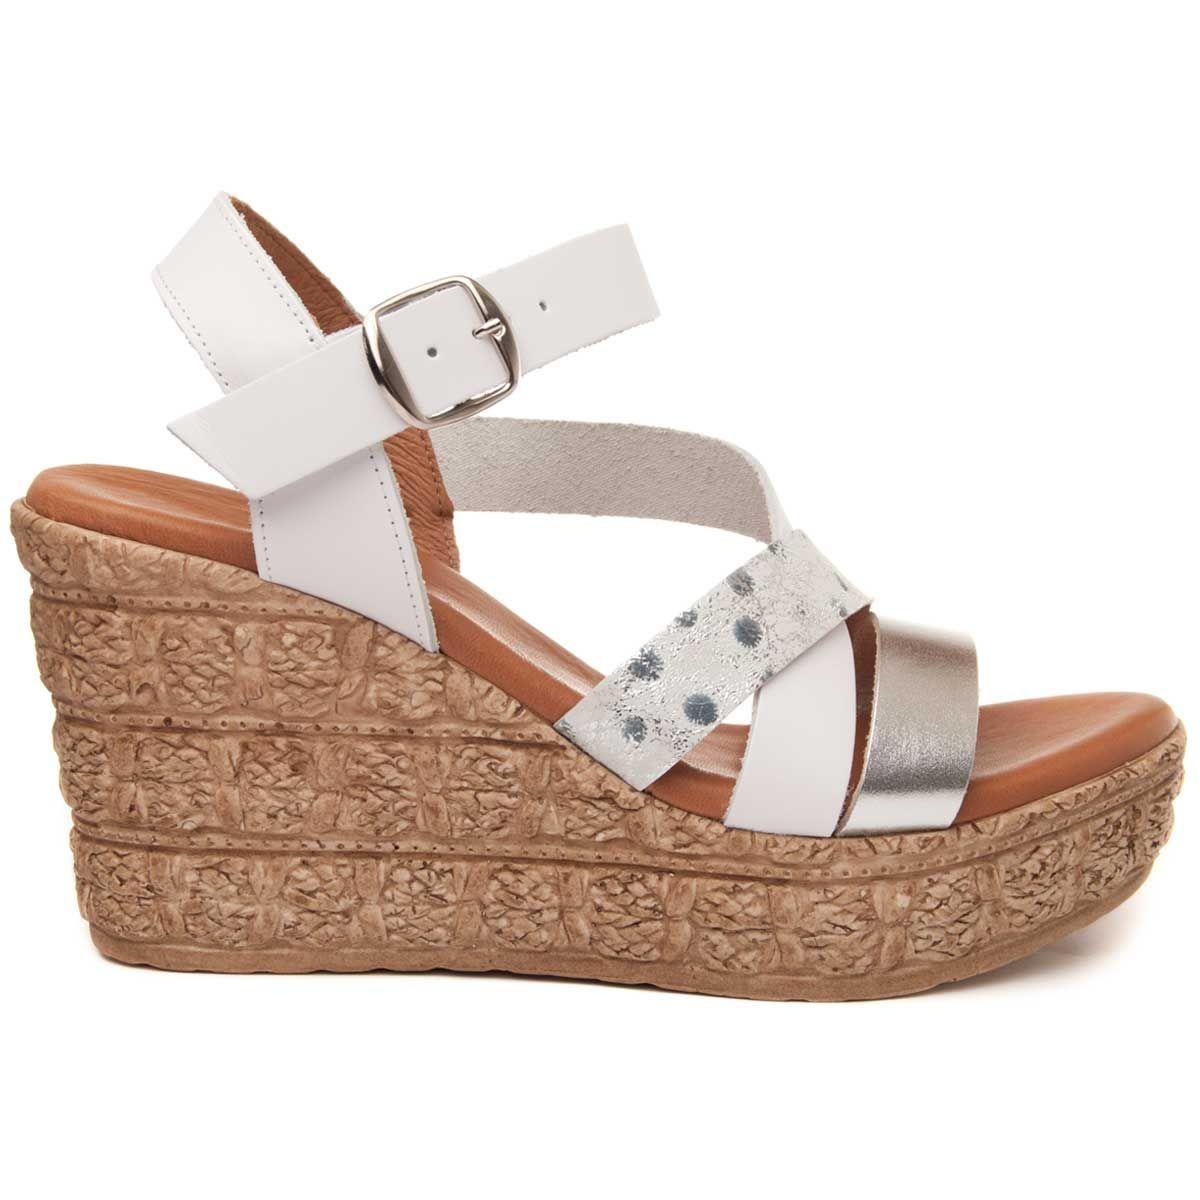 Montevita Chunky Heel Sandal in White